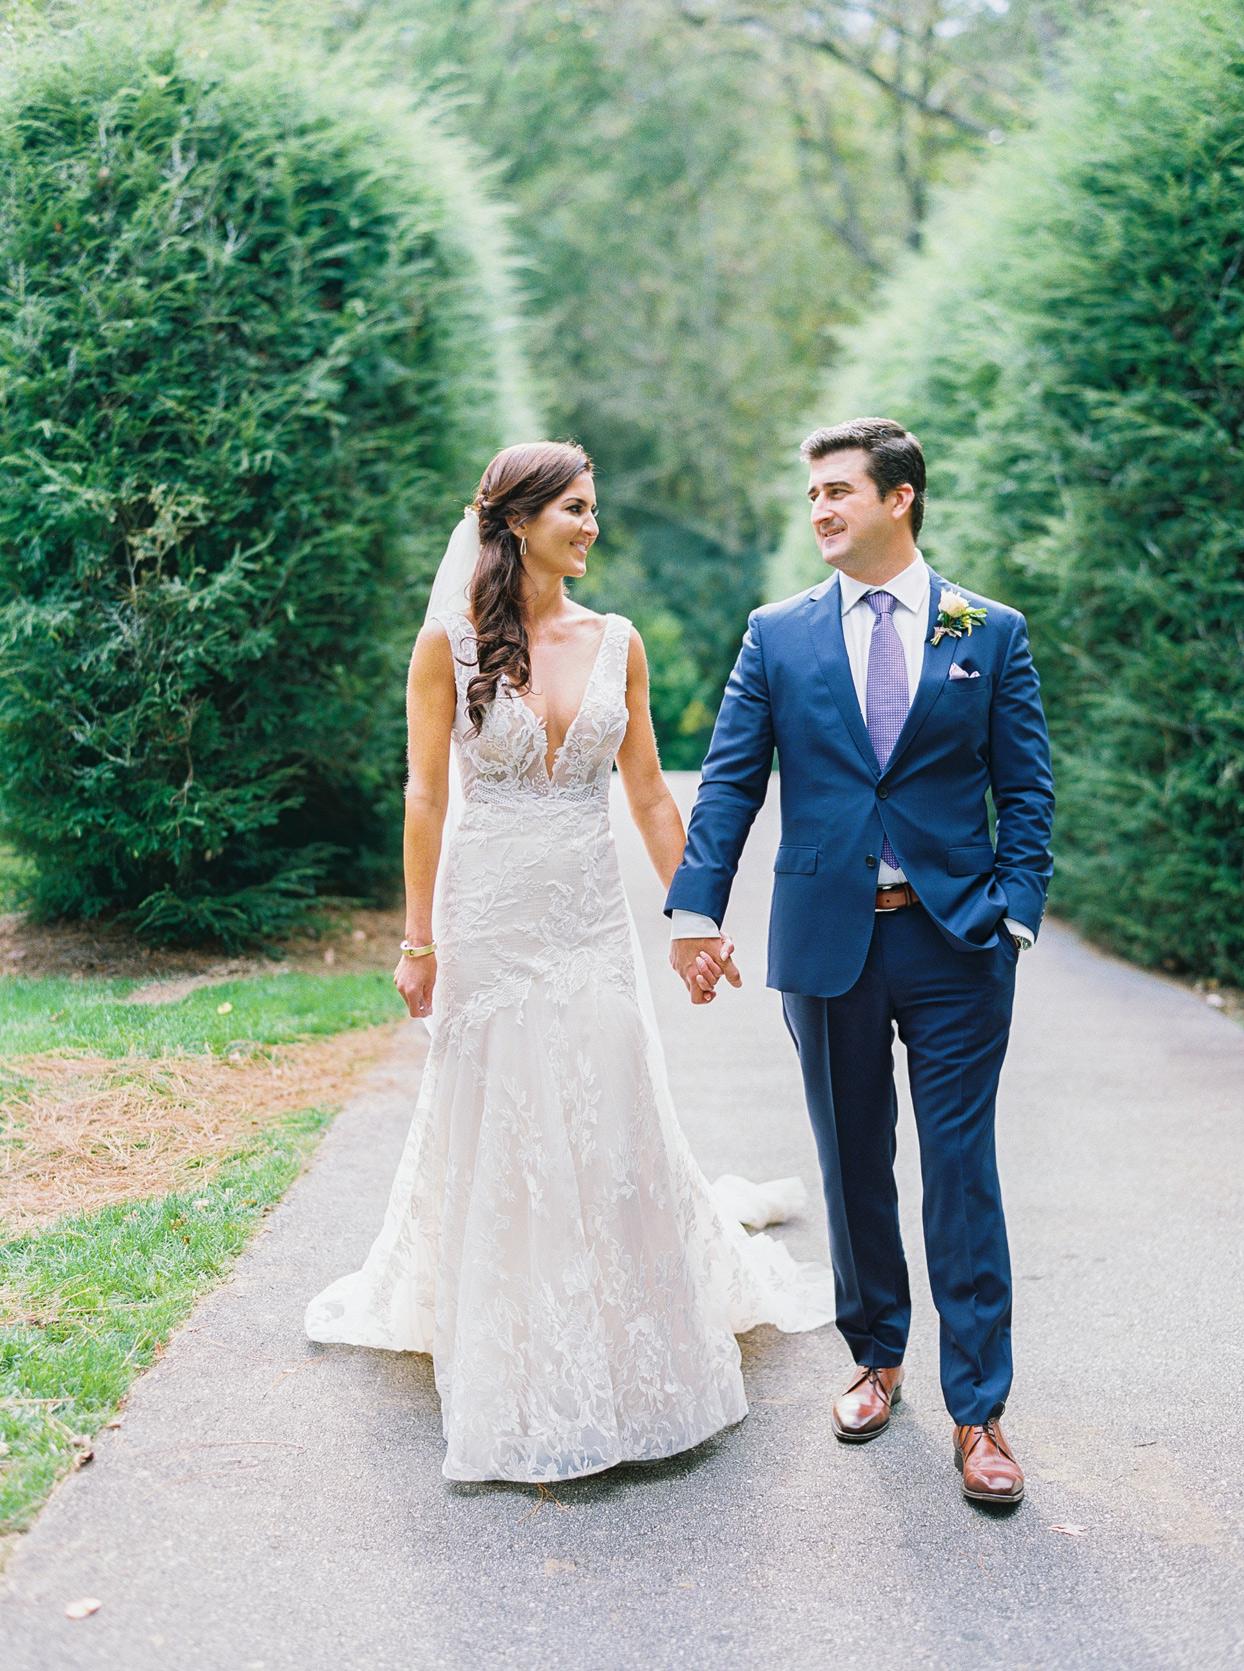 Bride and groom walking down sidewalk together